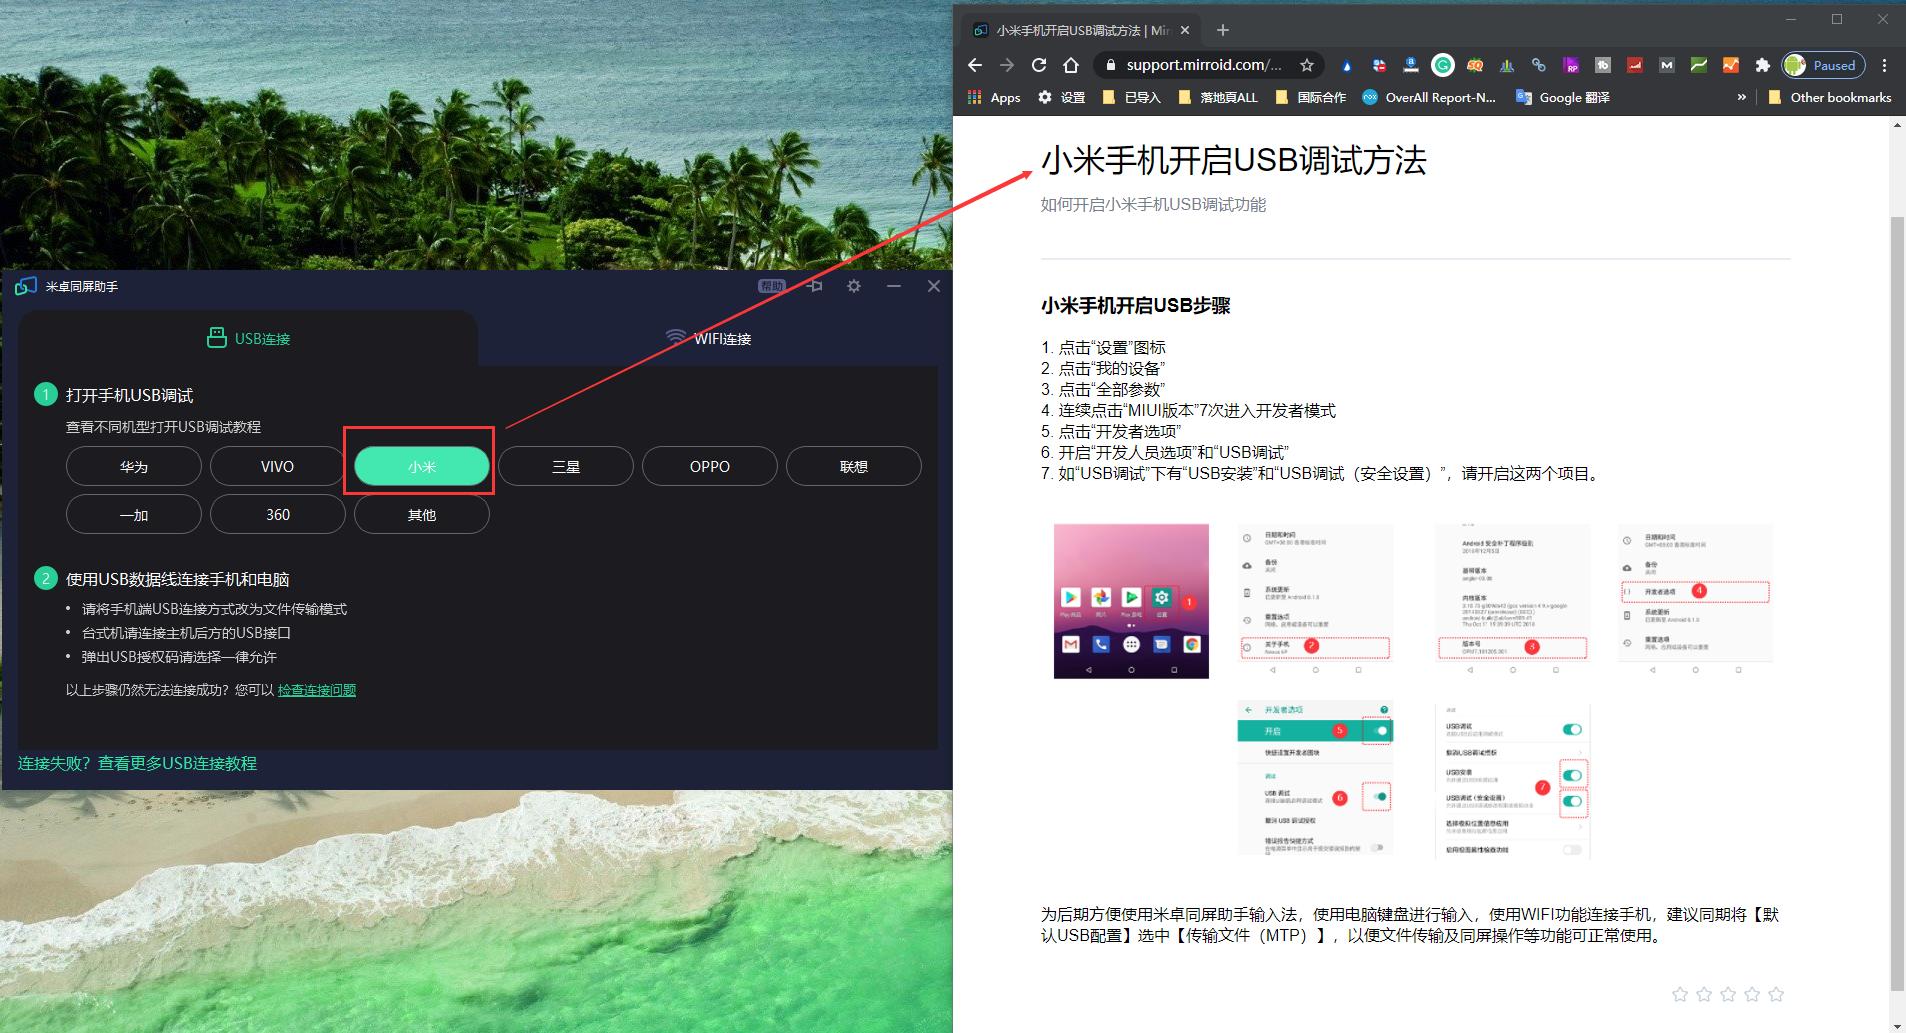 WIFI如何連接米卓同屏助手和手機?WIFI如何連接米卓同屏助手和手機教程